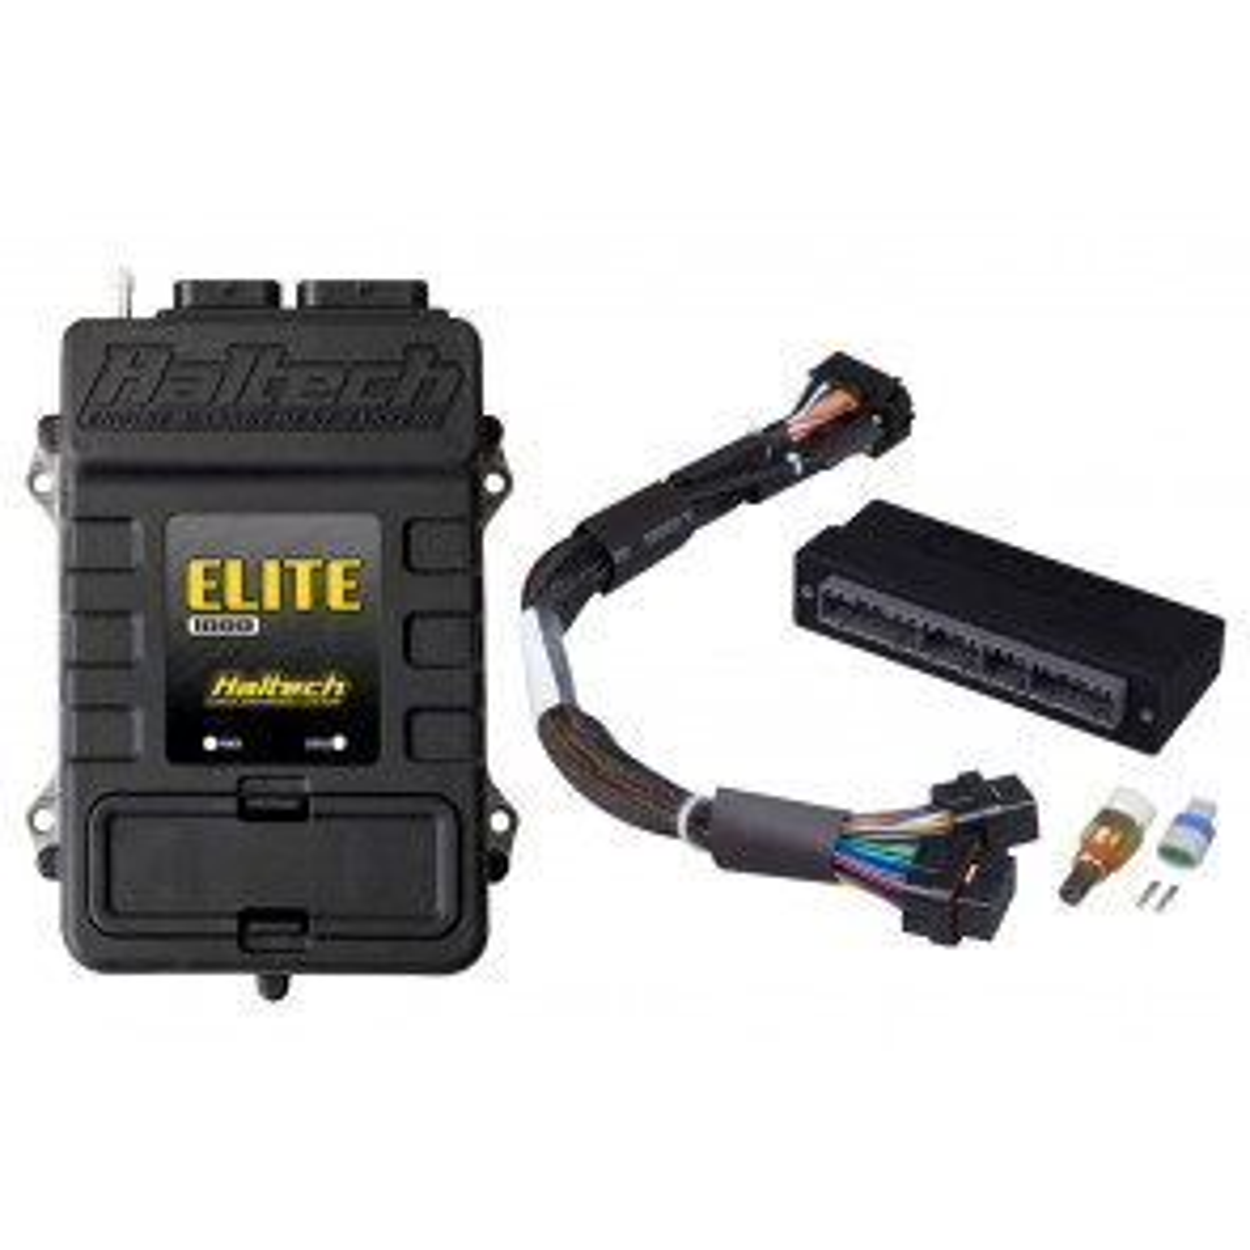 Haltech Elite 1000+ ECU Subaru WRX MY99-00 With Plug 'n' Play Adaptor Harness Kit